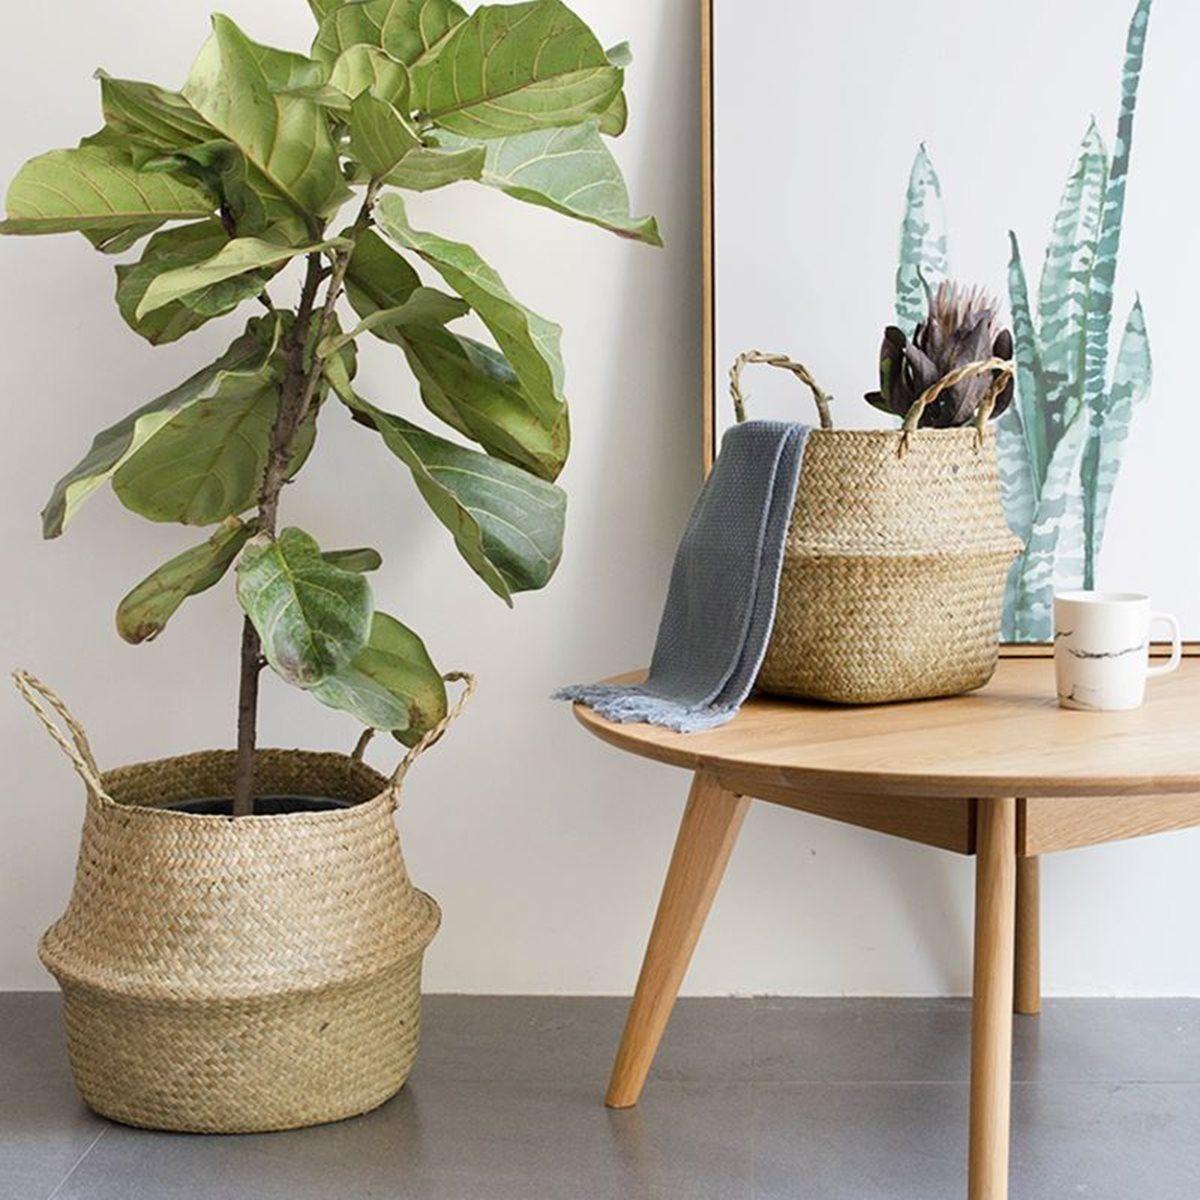 Grosshandel Rattan Pflanze Blumentopfe 2 Teile Satz Boden